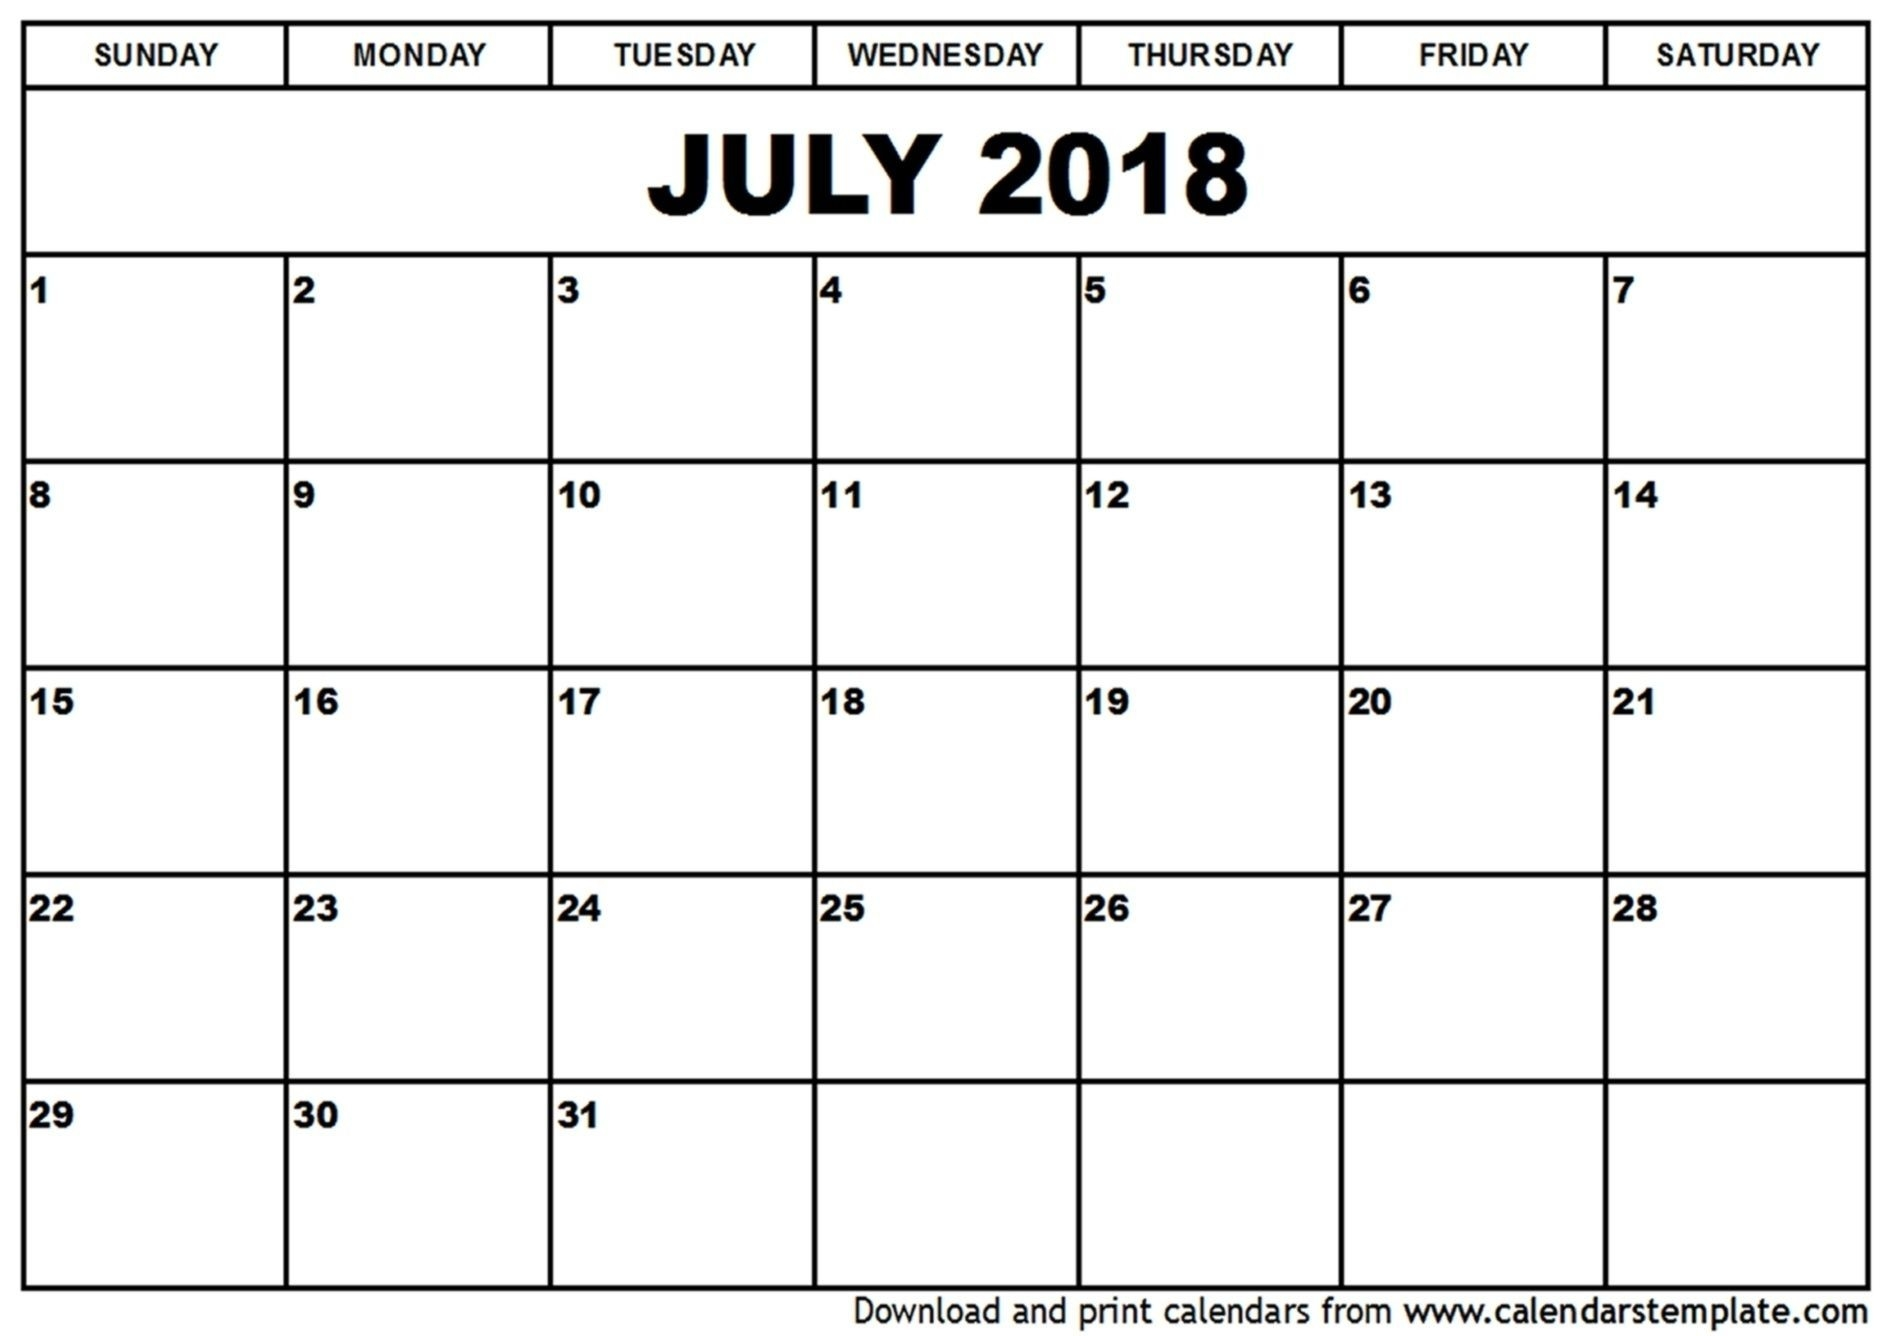 Free Printable 4X6 Monthly Calendar   Blank Monthly Calendar-4X6 Free Printables 2021 Calendars